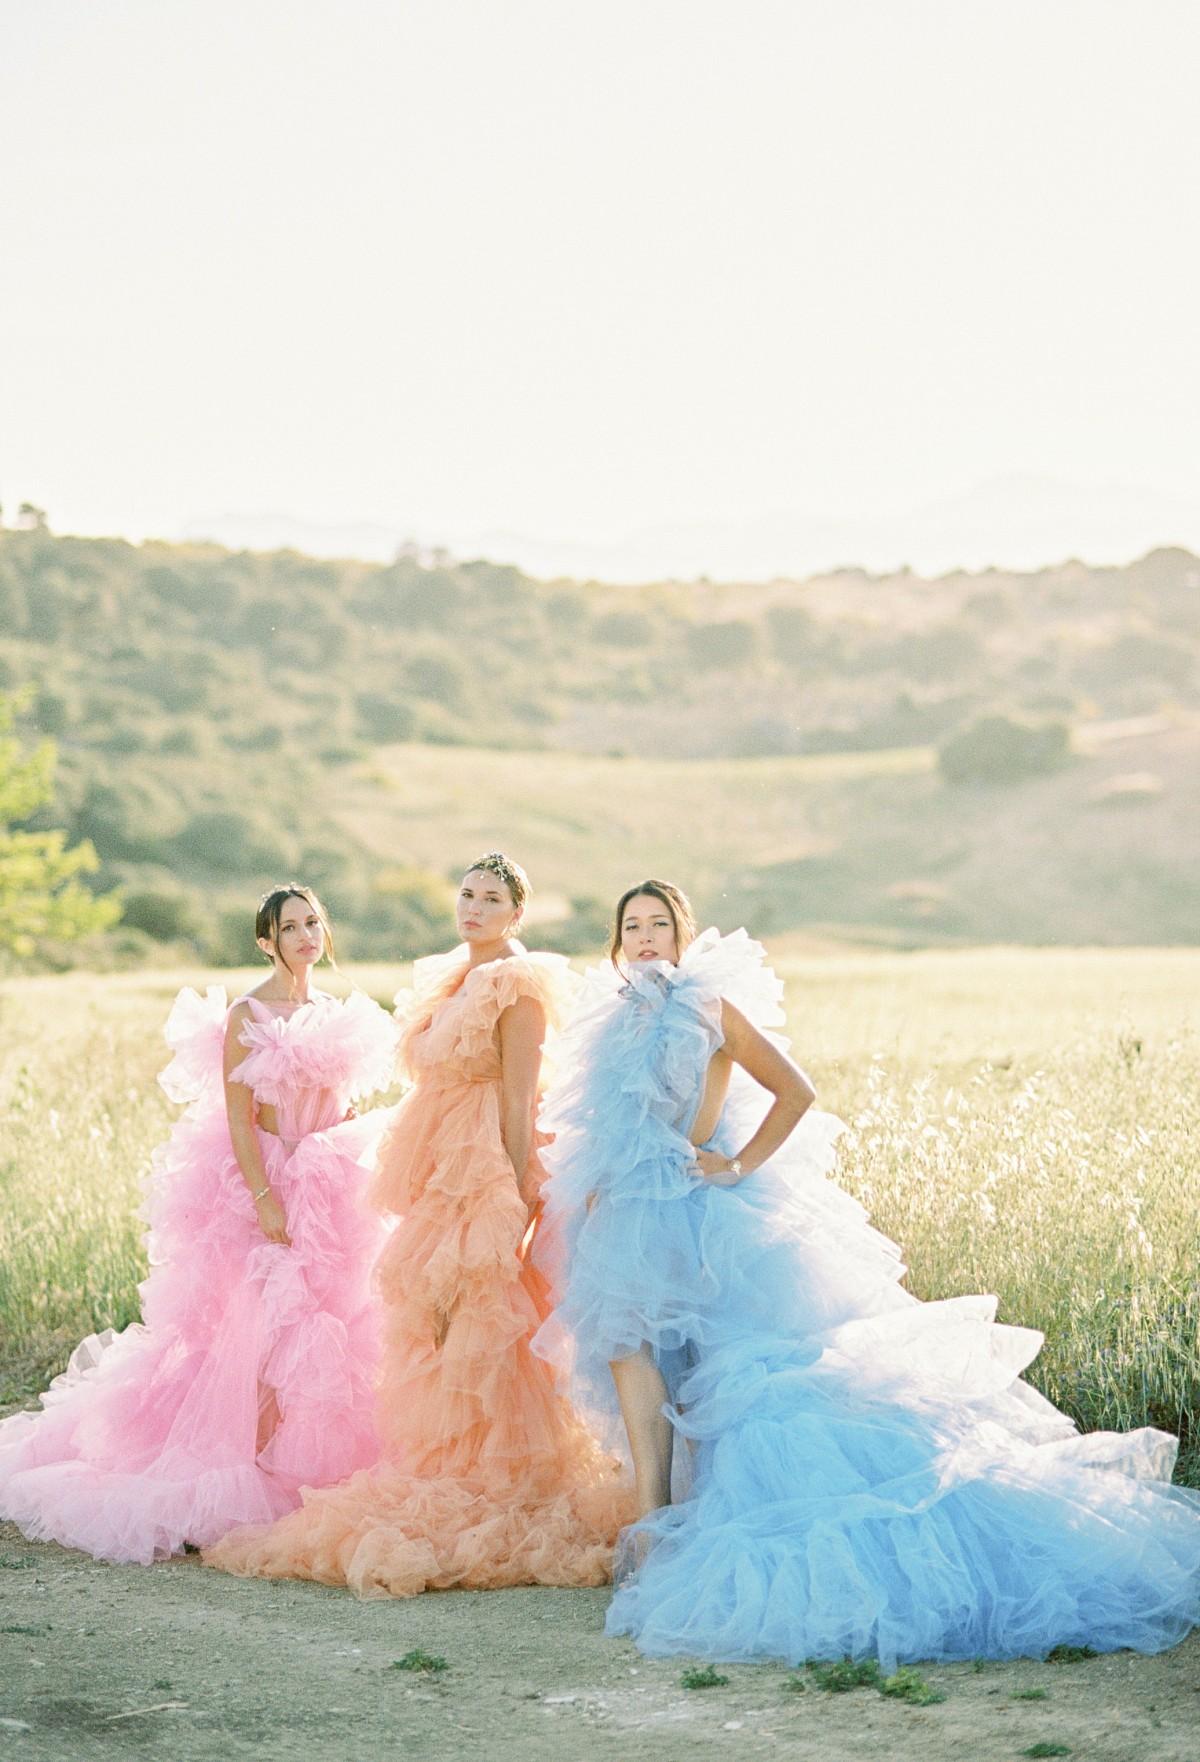 Millia London dresses